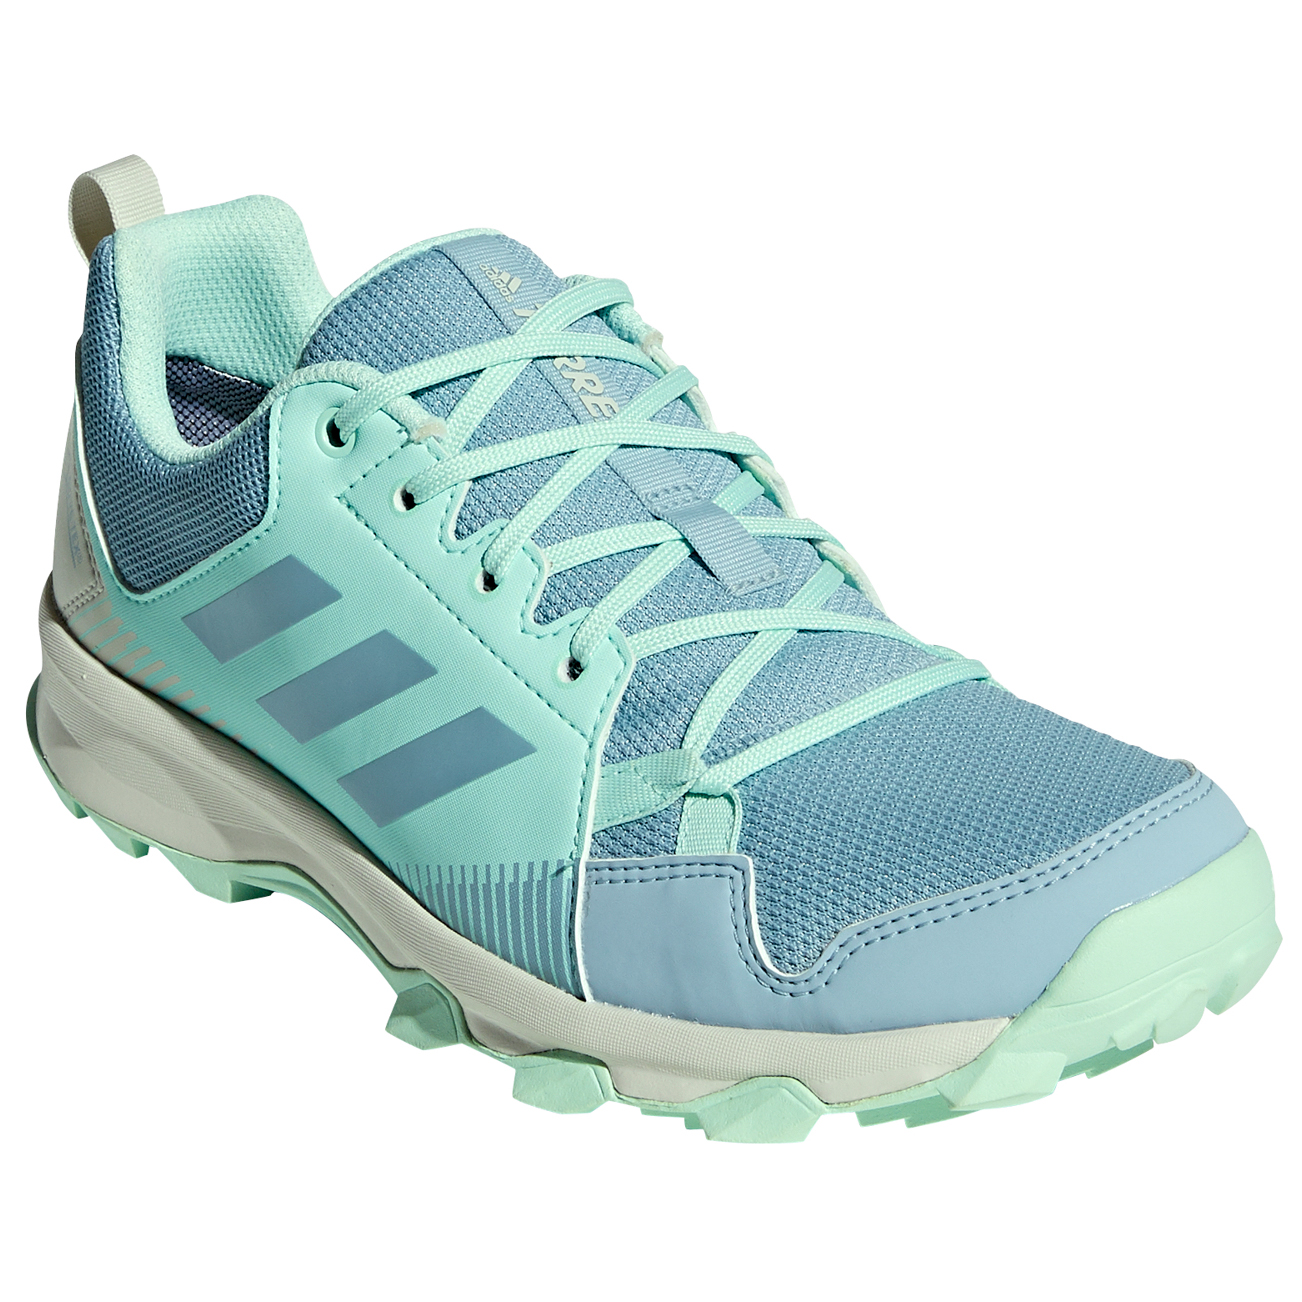 adidas - Women's Terrex Tracerocker GTX - Chaussures de trail - Core Black  / Carbon / Ash Green | 4 (UK)